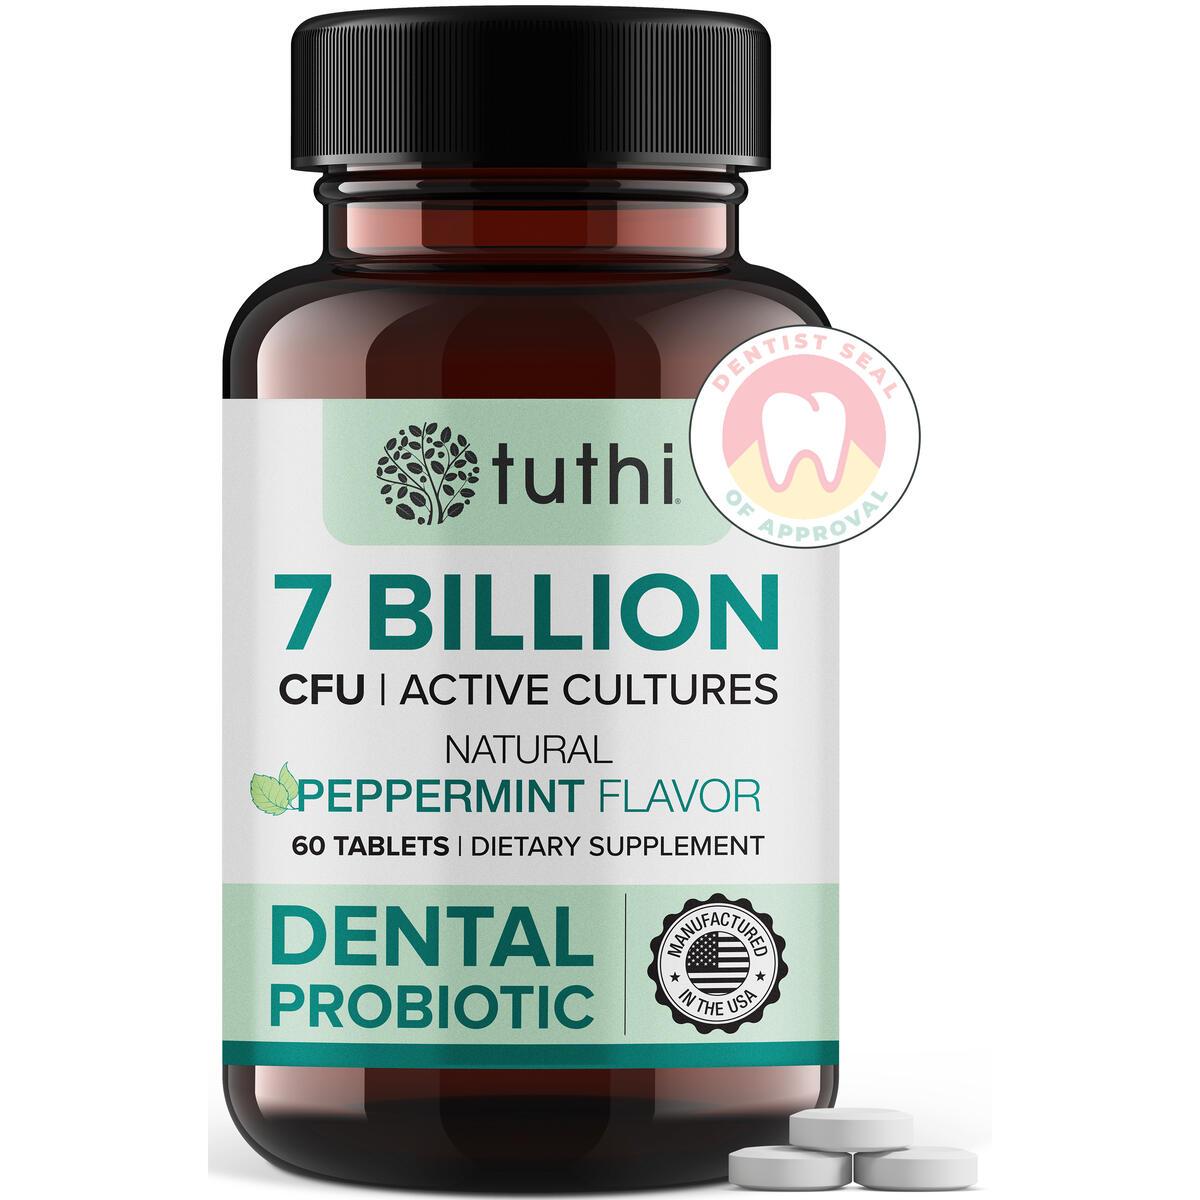 Dental Probiotics - Probiotic for Mouth Teeth & Gum Care - Oral Health - Fresh Breath - 60 Lozenges